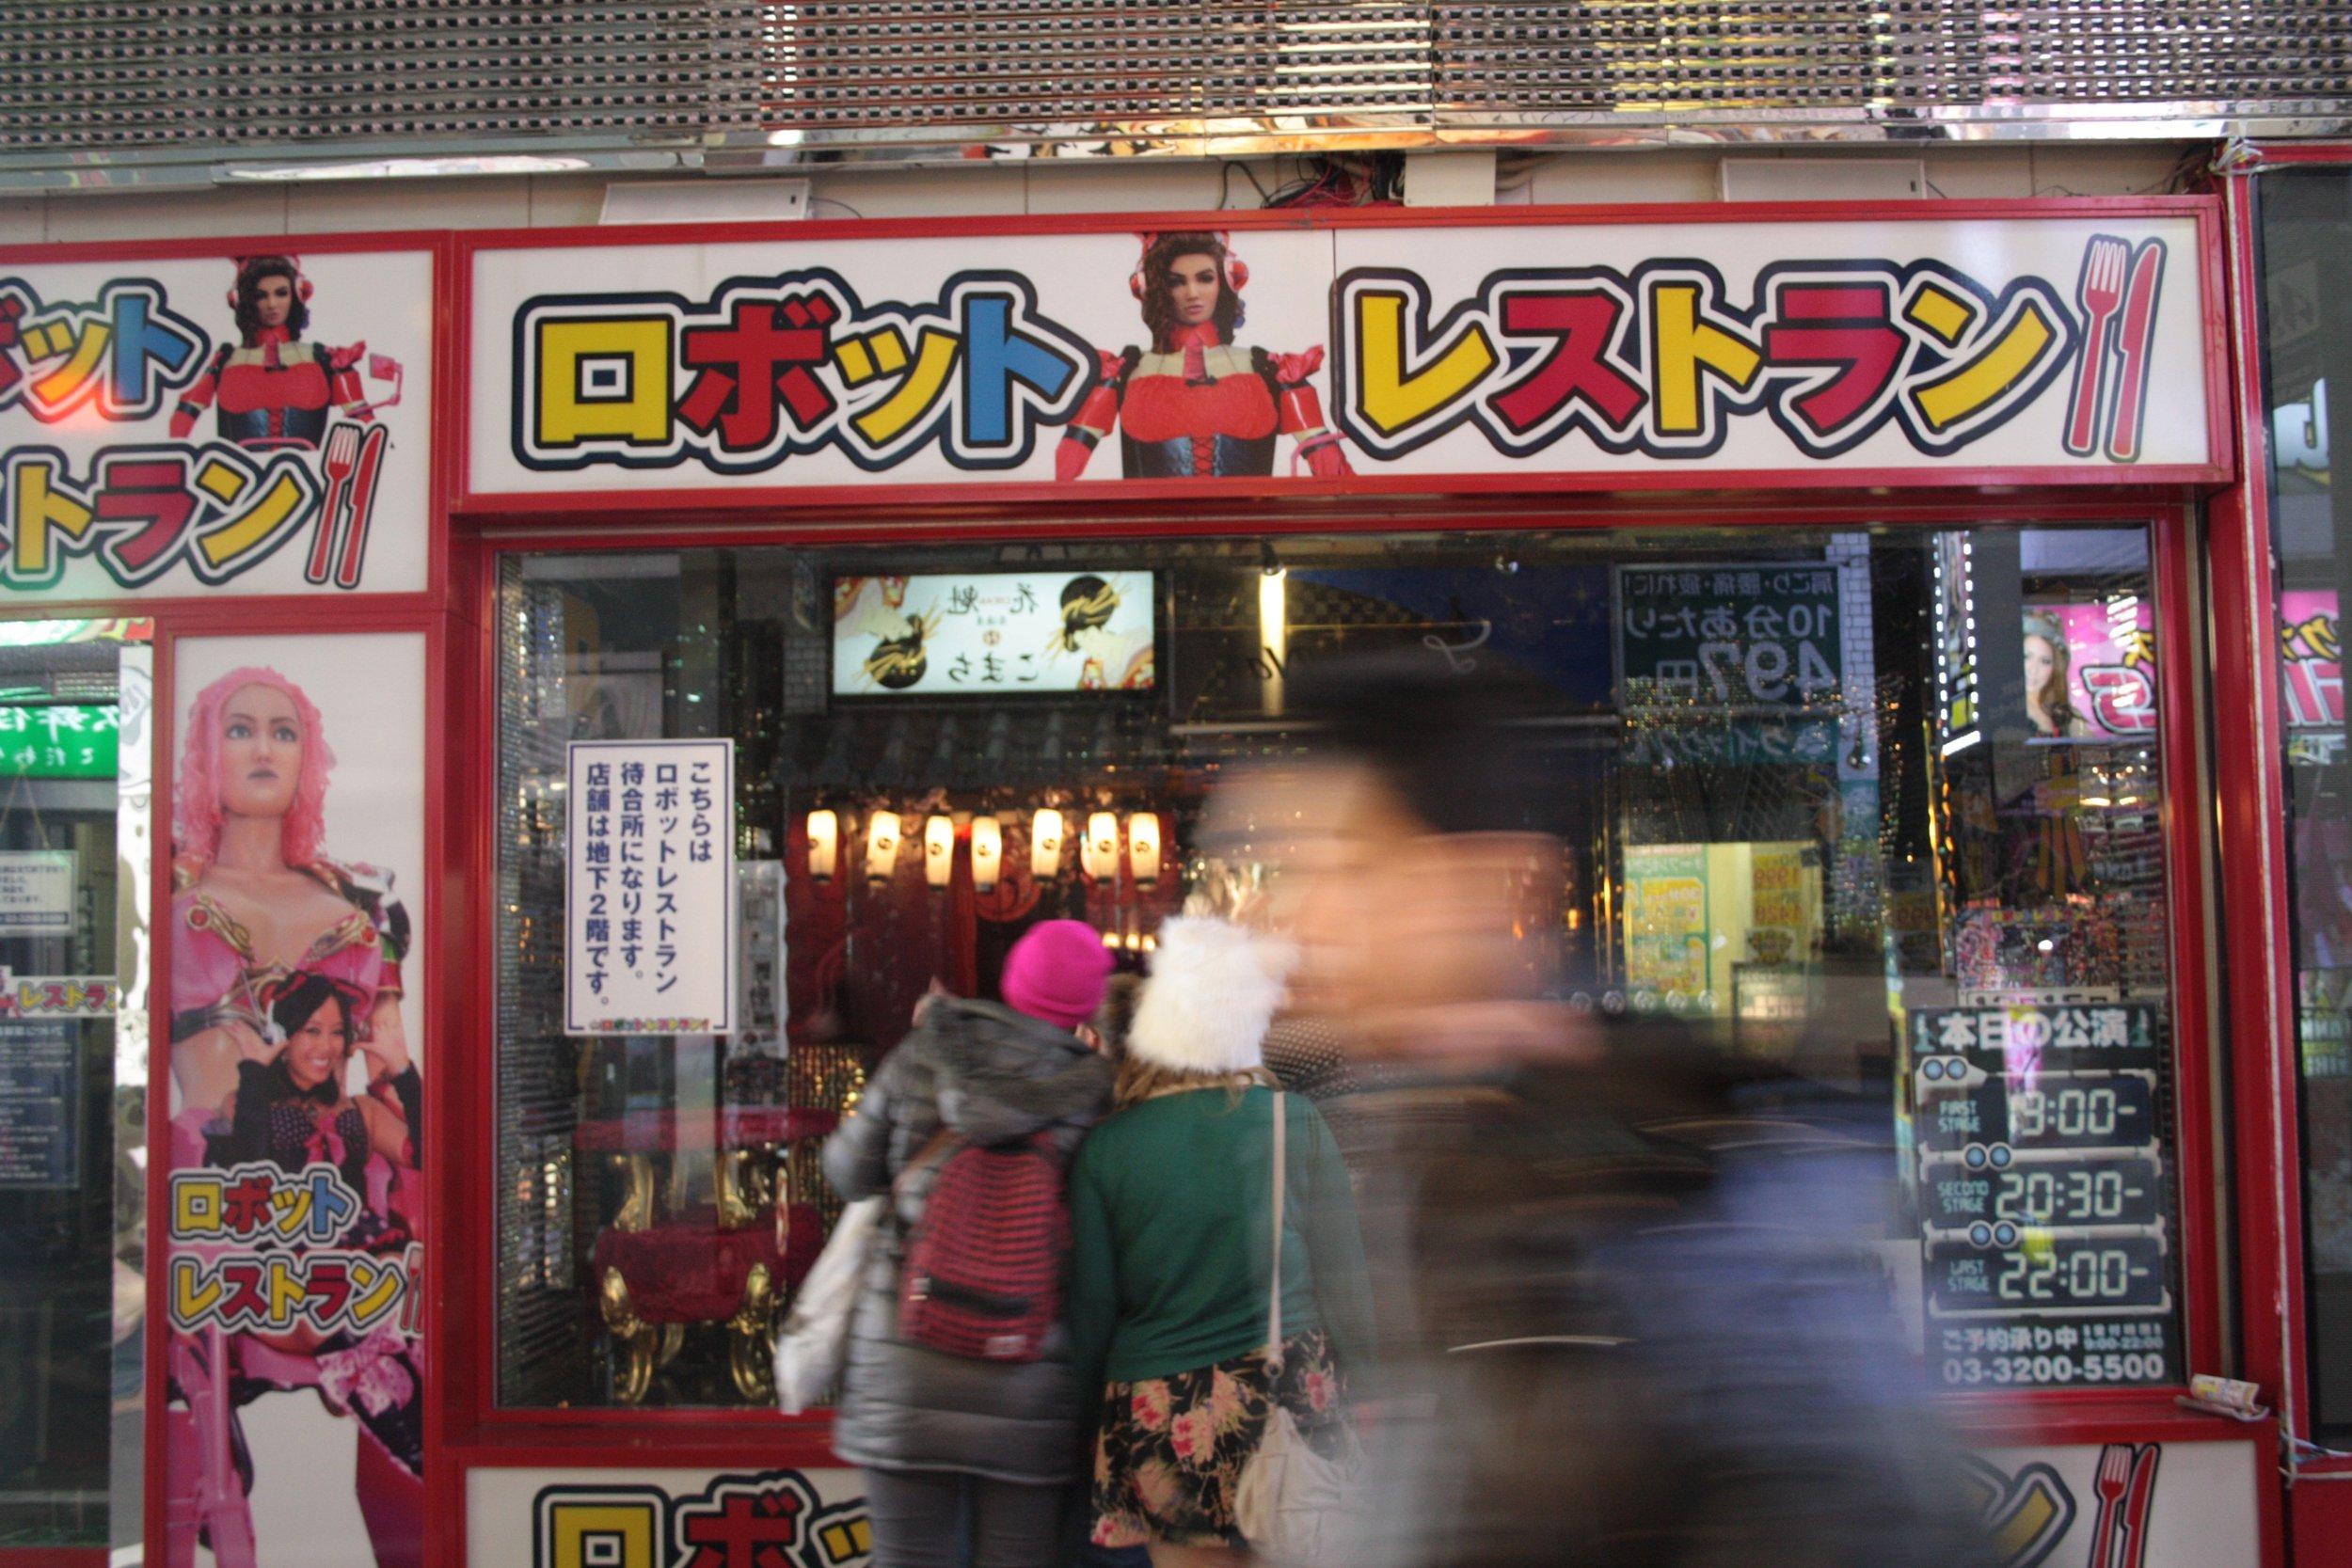 Step Up Japanese Fran Wrigley Robot Restaurant Tokyo Japanese Lessons Brighton.jpg